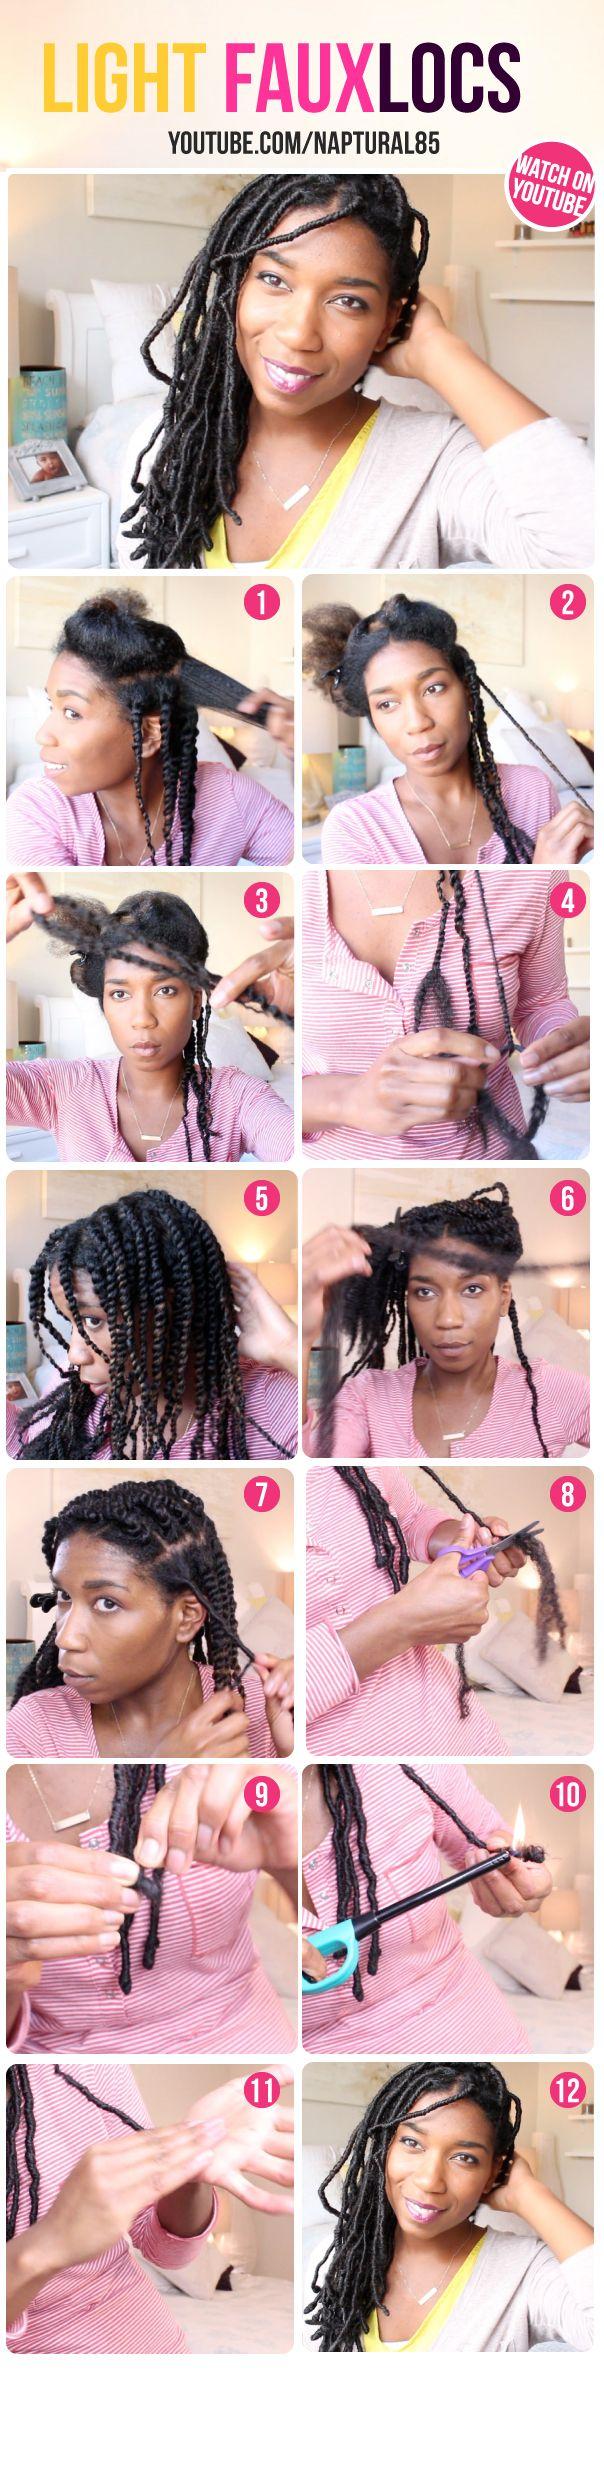 Naptural85 - Natural Hair Care Tips - Blog Content